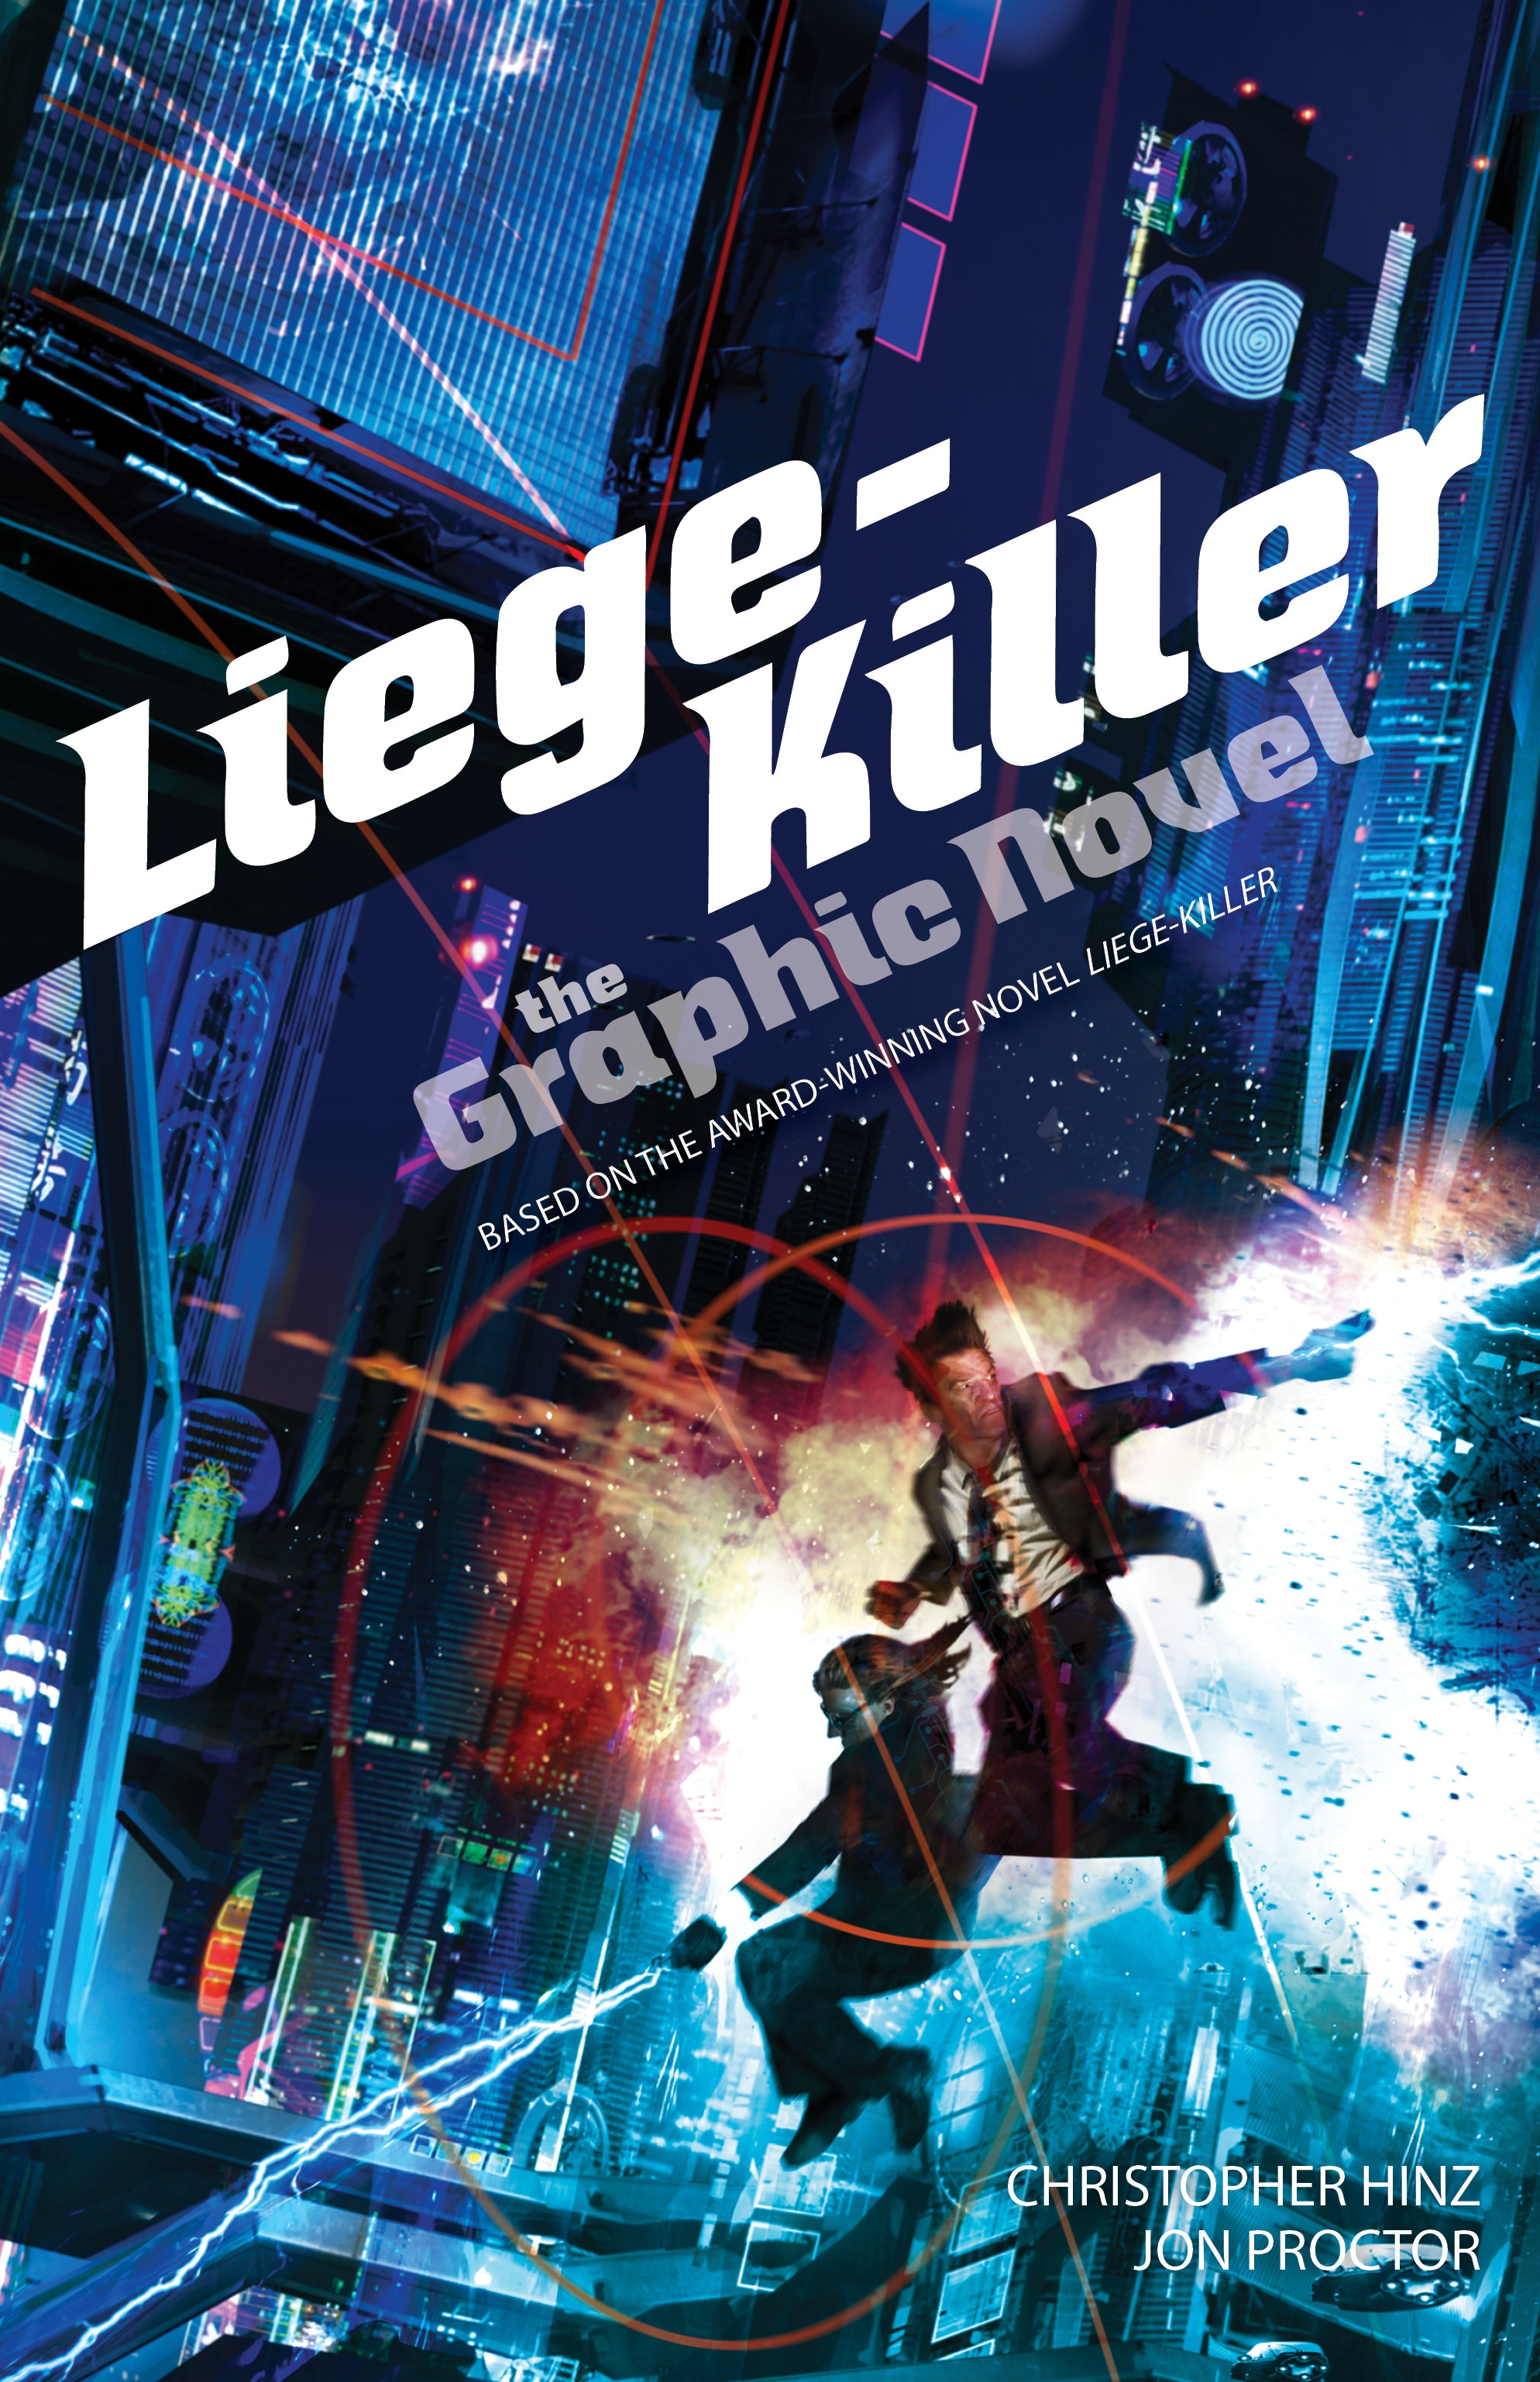 Liege-Killer The Graphic Novel